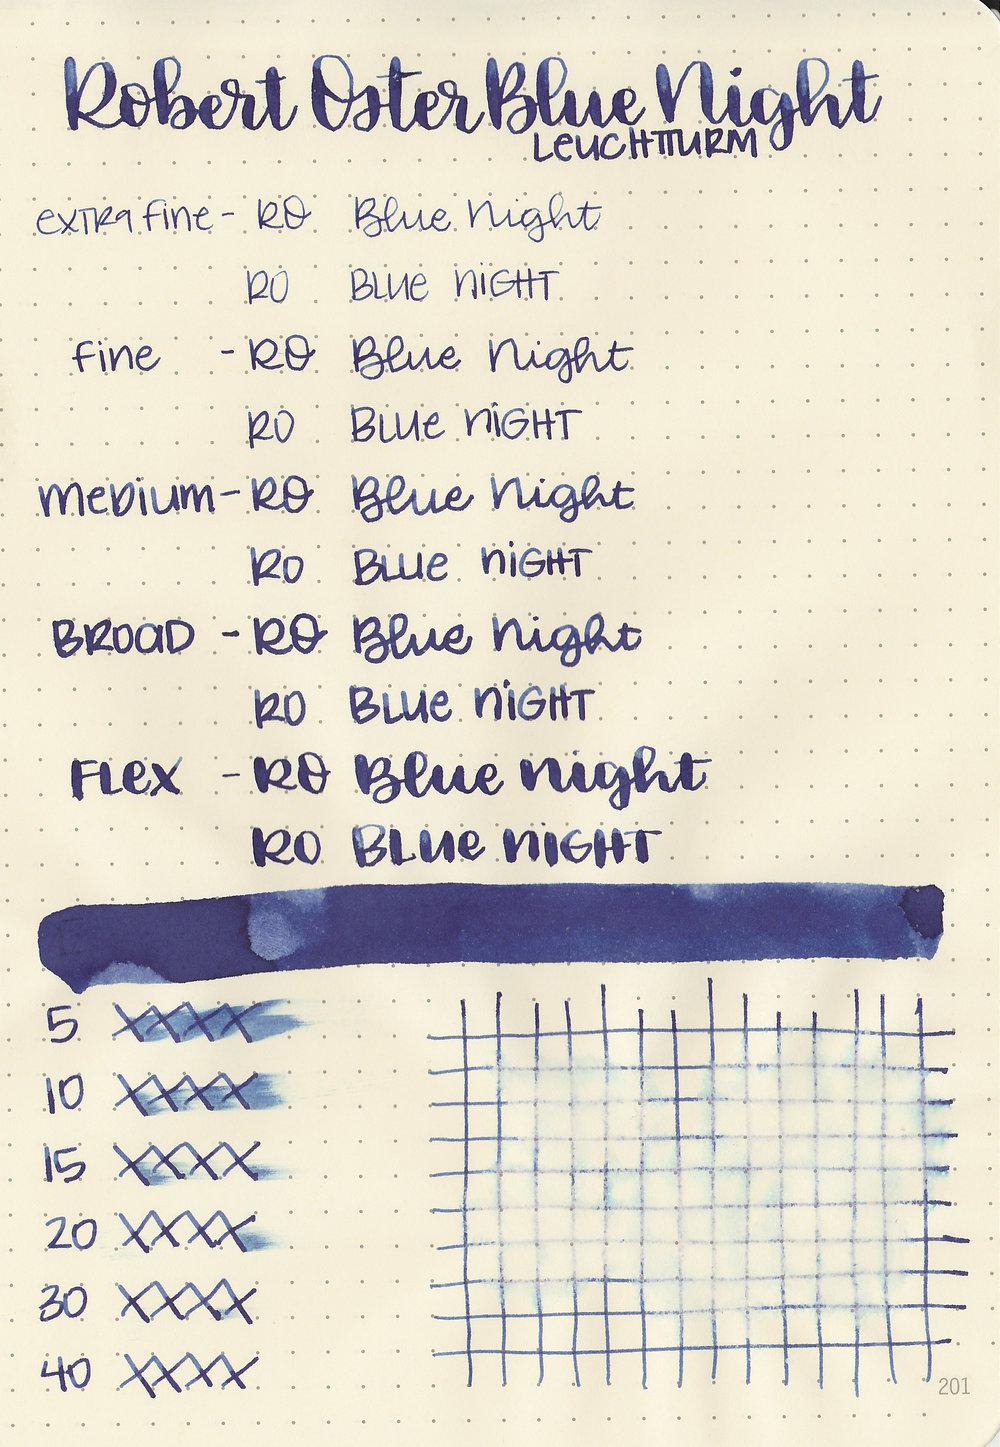 ro-blue-night-6.jpg